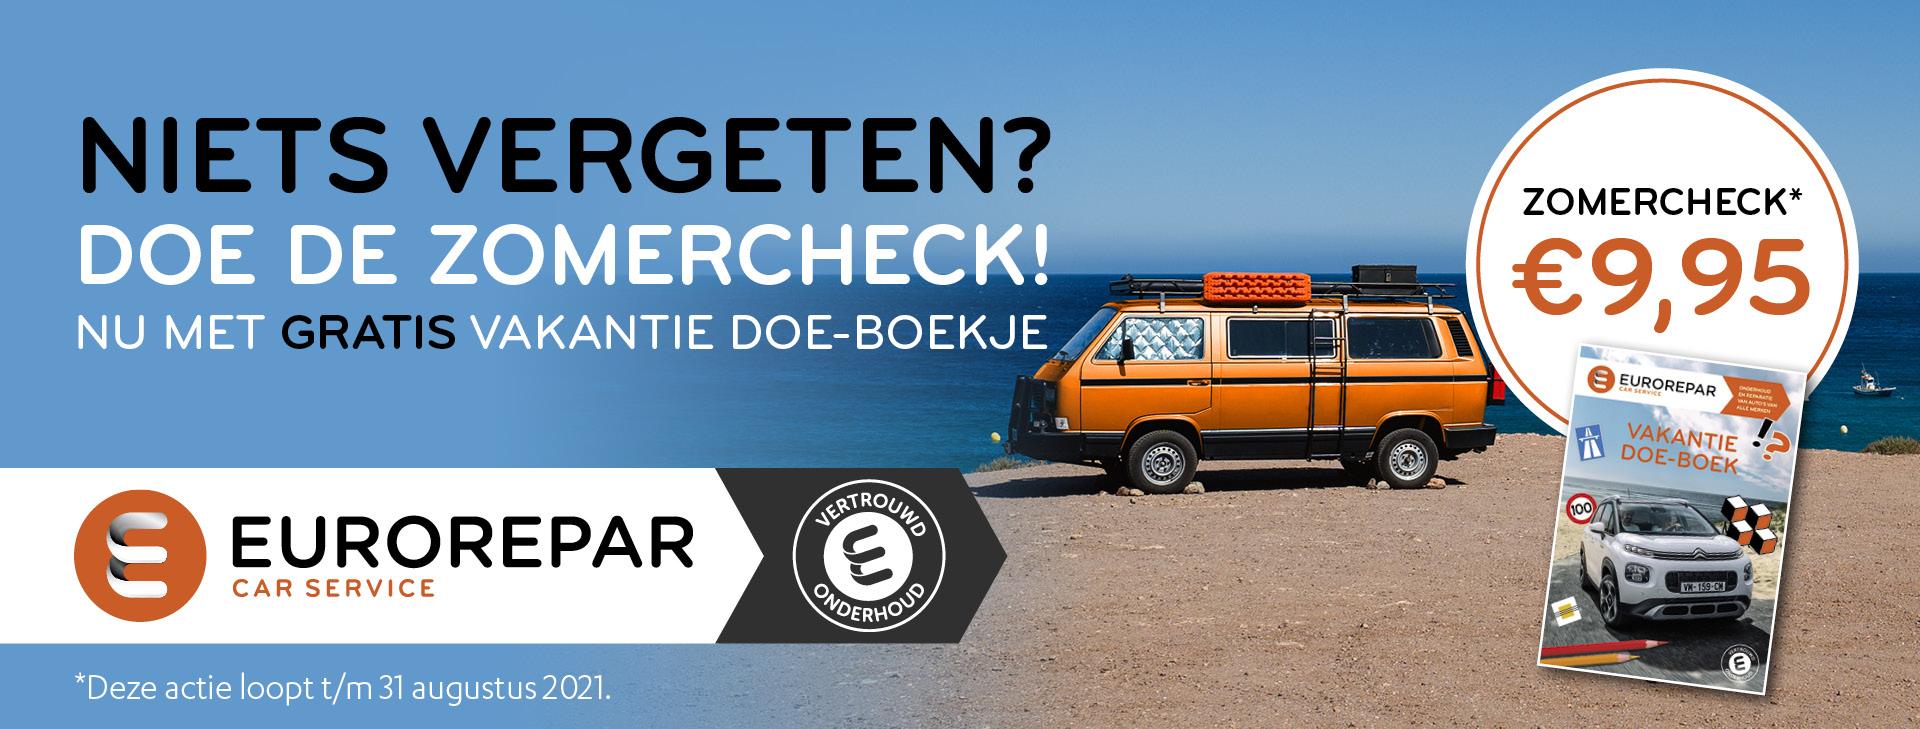 Zomercheck Autoservice de Olm Eurorepar Car Service